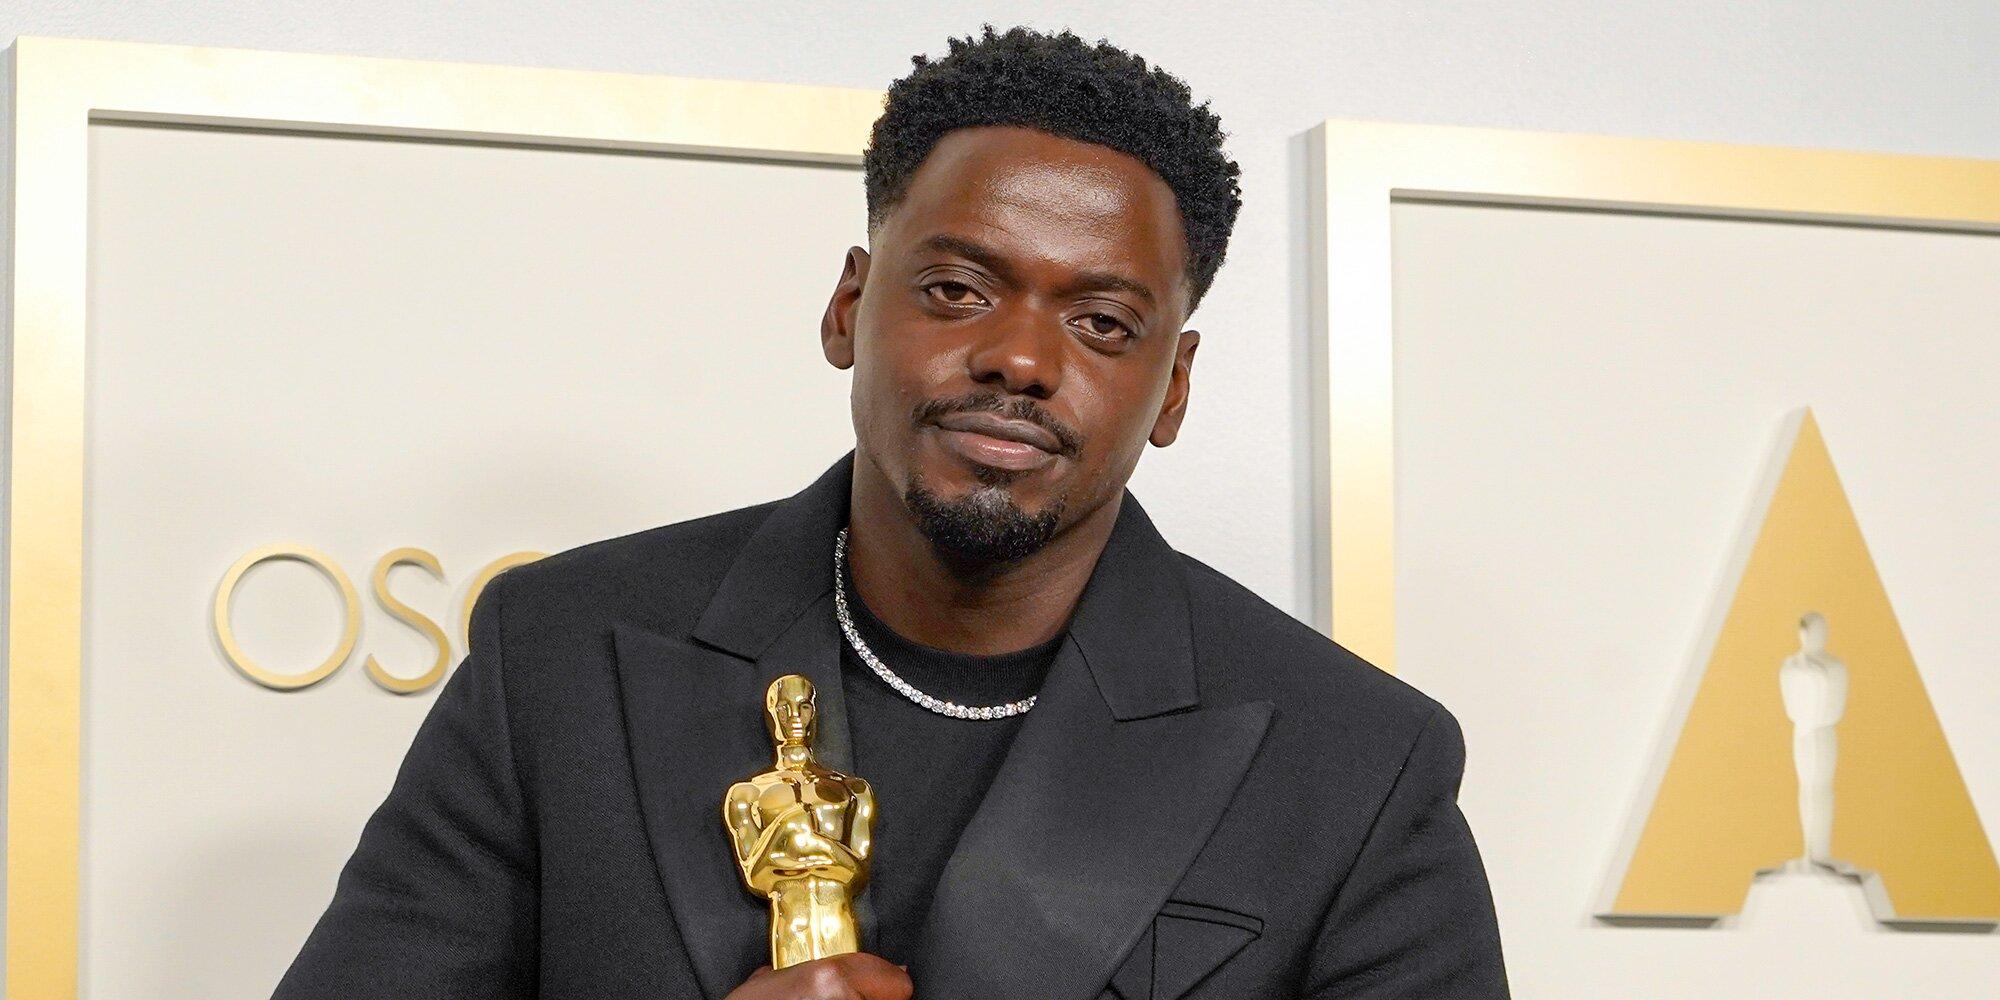 HFPA journalist denies mistaking Daniel Kaluuya for Leslie Odom Jr. at Oscars